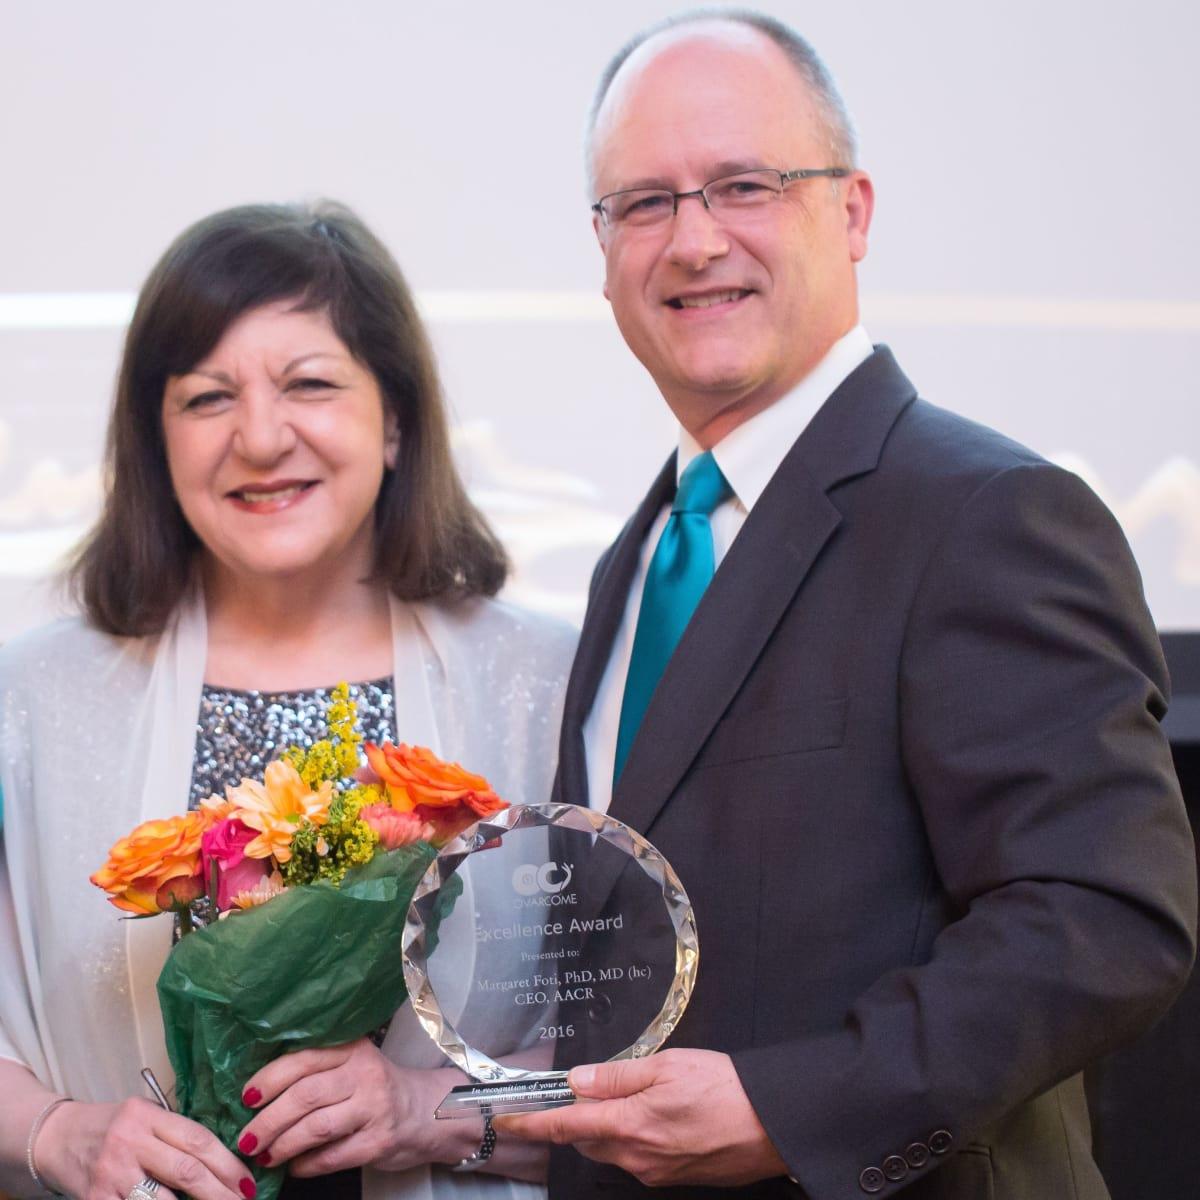 Ovarcome gala, Dr. Margaret Foti and Rob Heifner